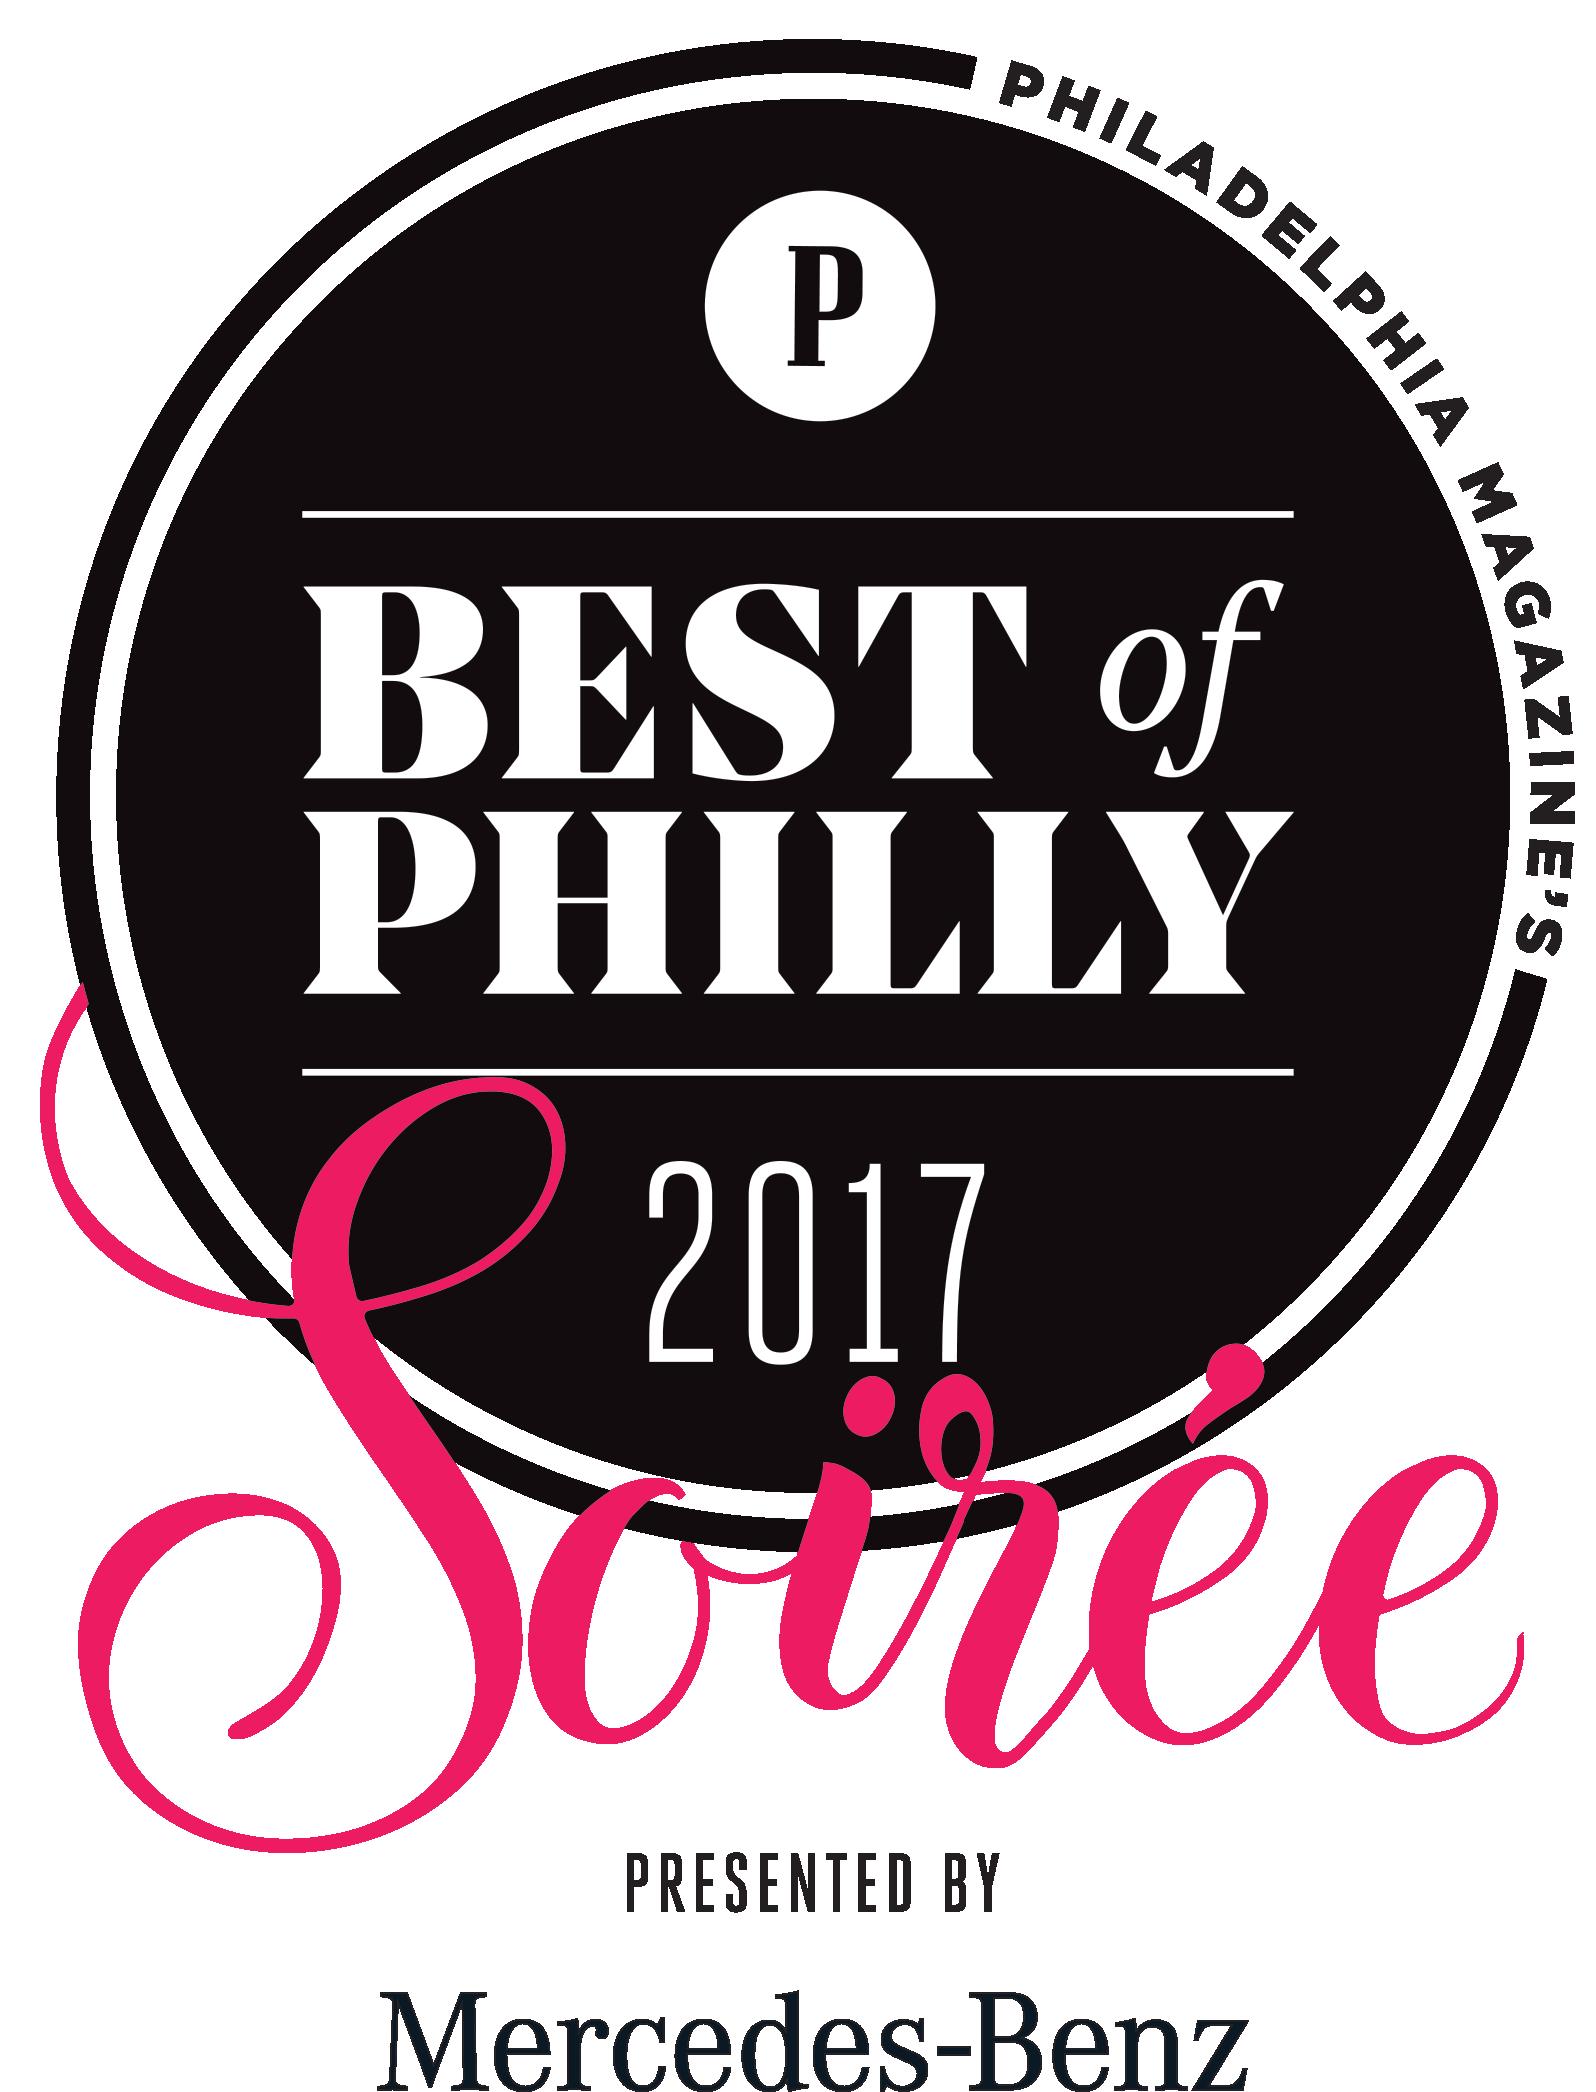 Best Philadelphia Nyc Makeup: Best Of Philly Soirée